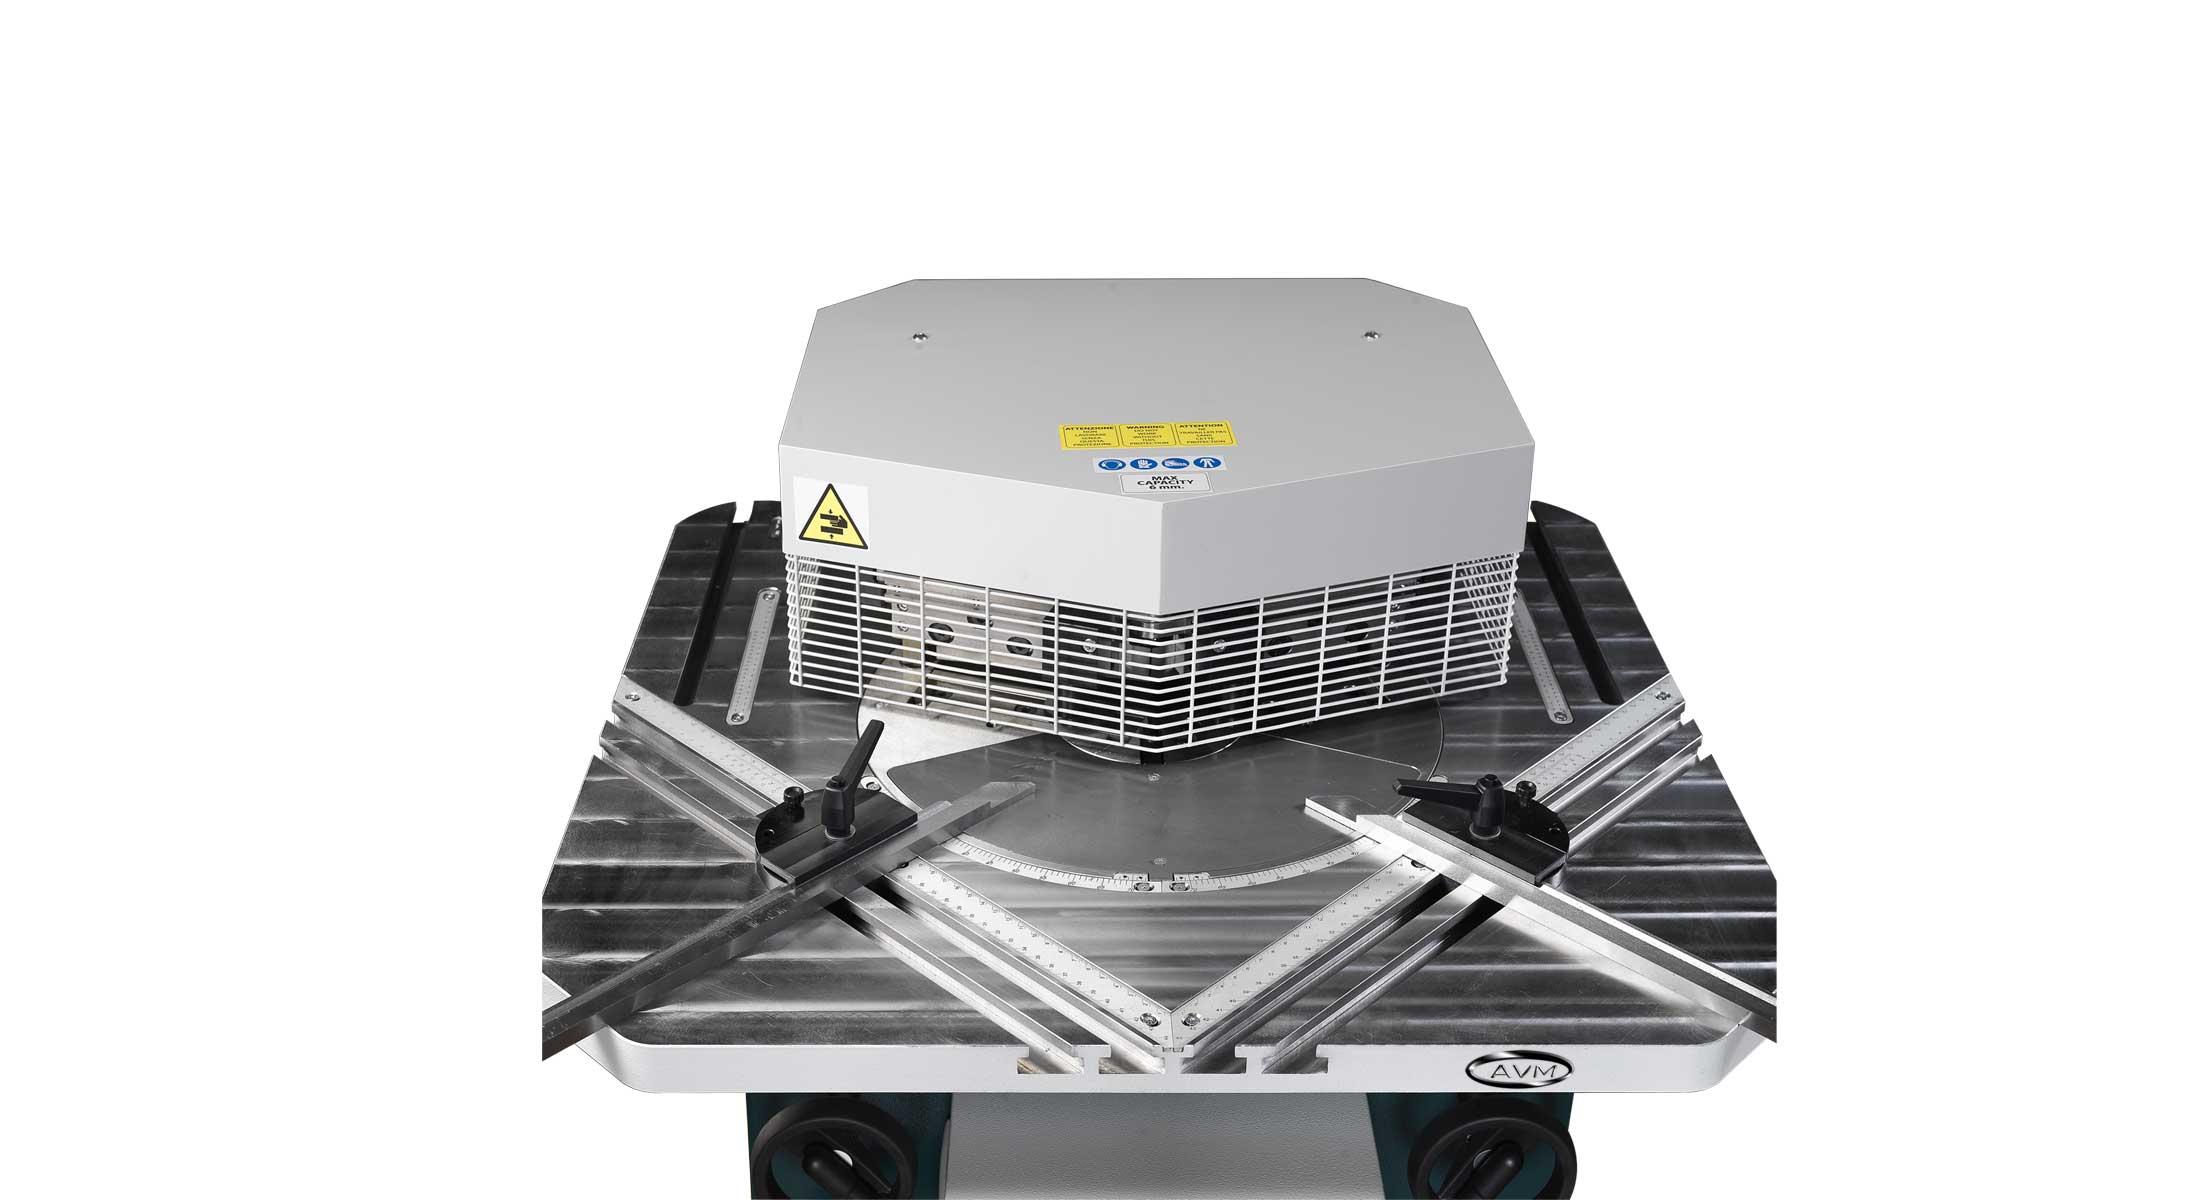 Tranciatrice SAV 206 AVM Srl